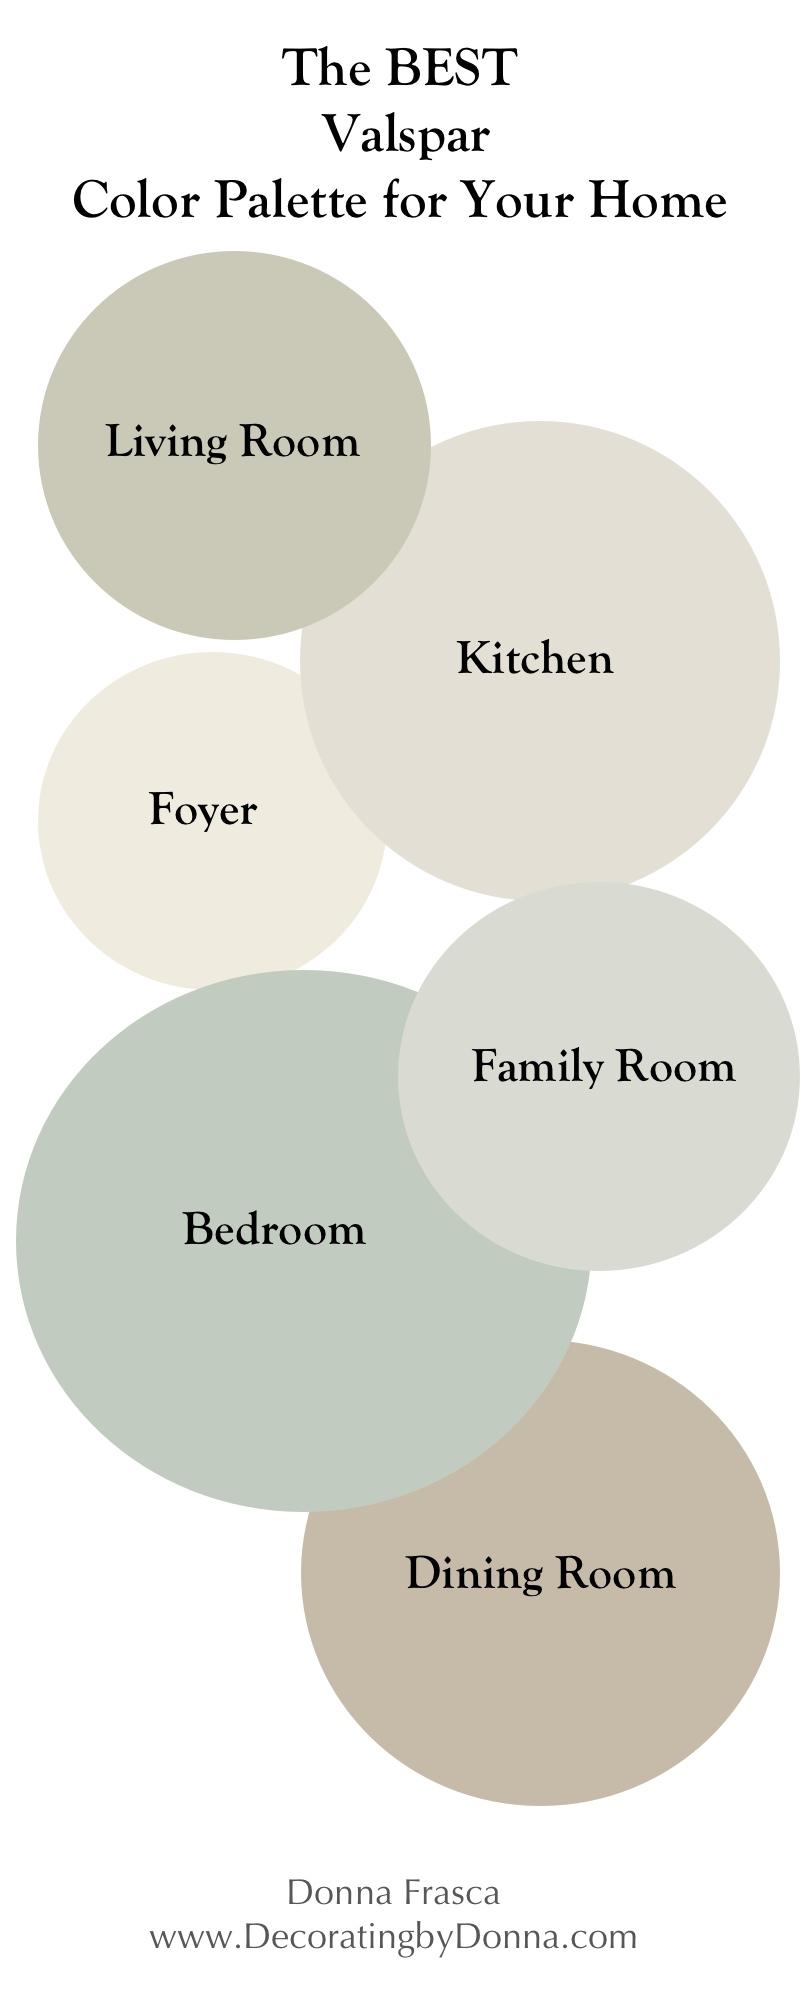 The Best Valspar Color Palette For Your Home | Decorating by Donna ...